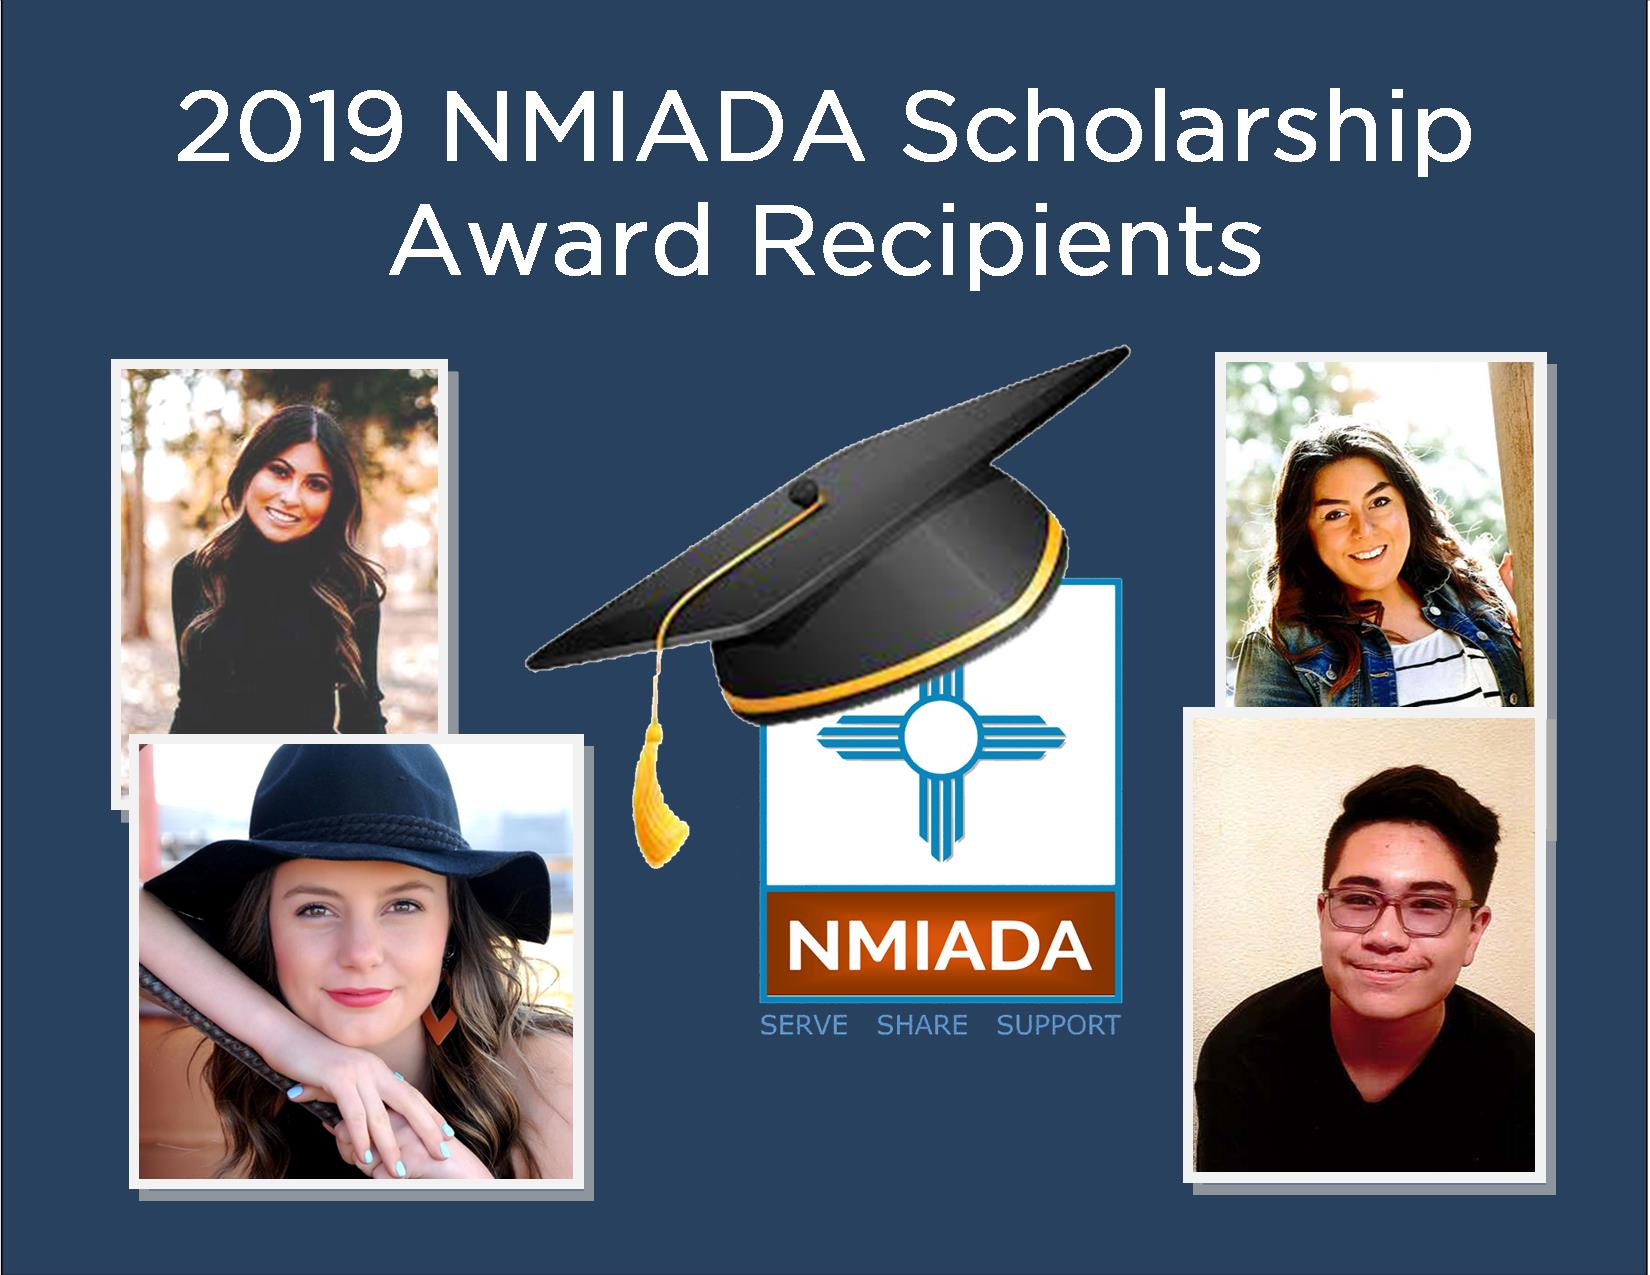 2019 nmiada scholarship recipient 1.png